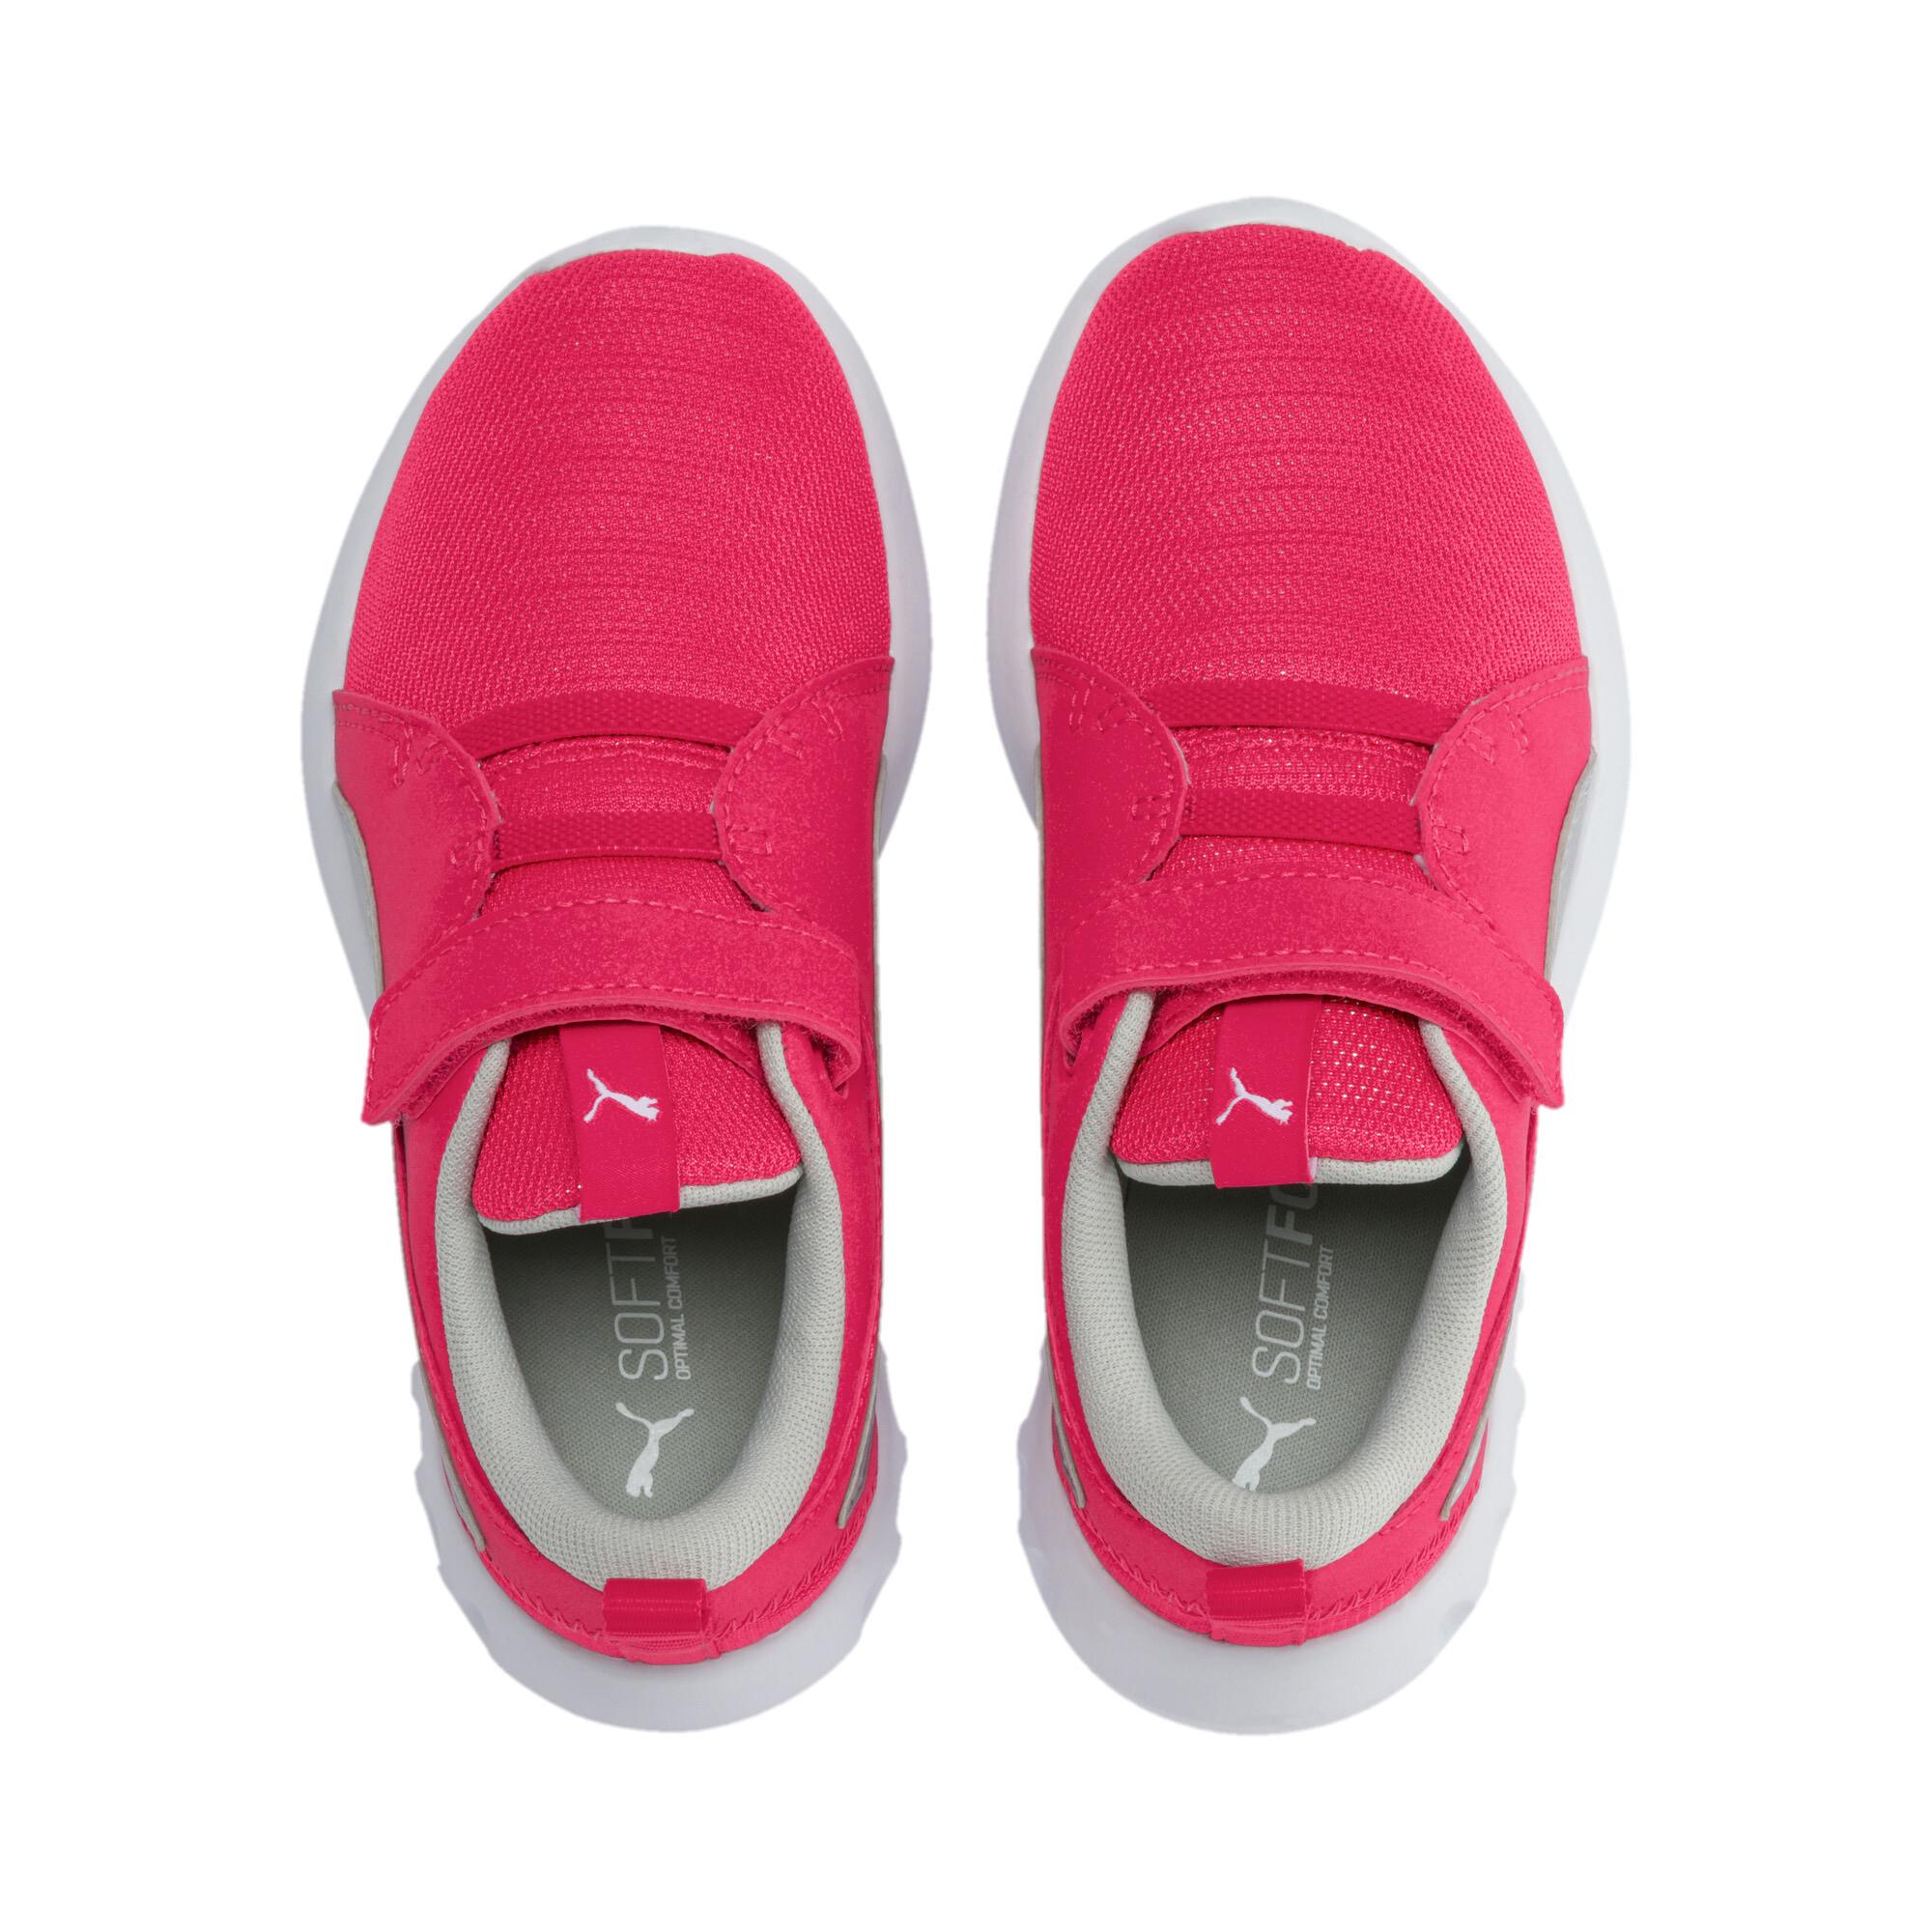 PUMA-Carson-2-Glitz-AC-Shoes-PS-Girls-Shoe-Kids thumbnail 7